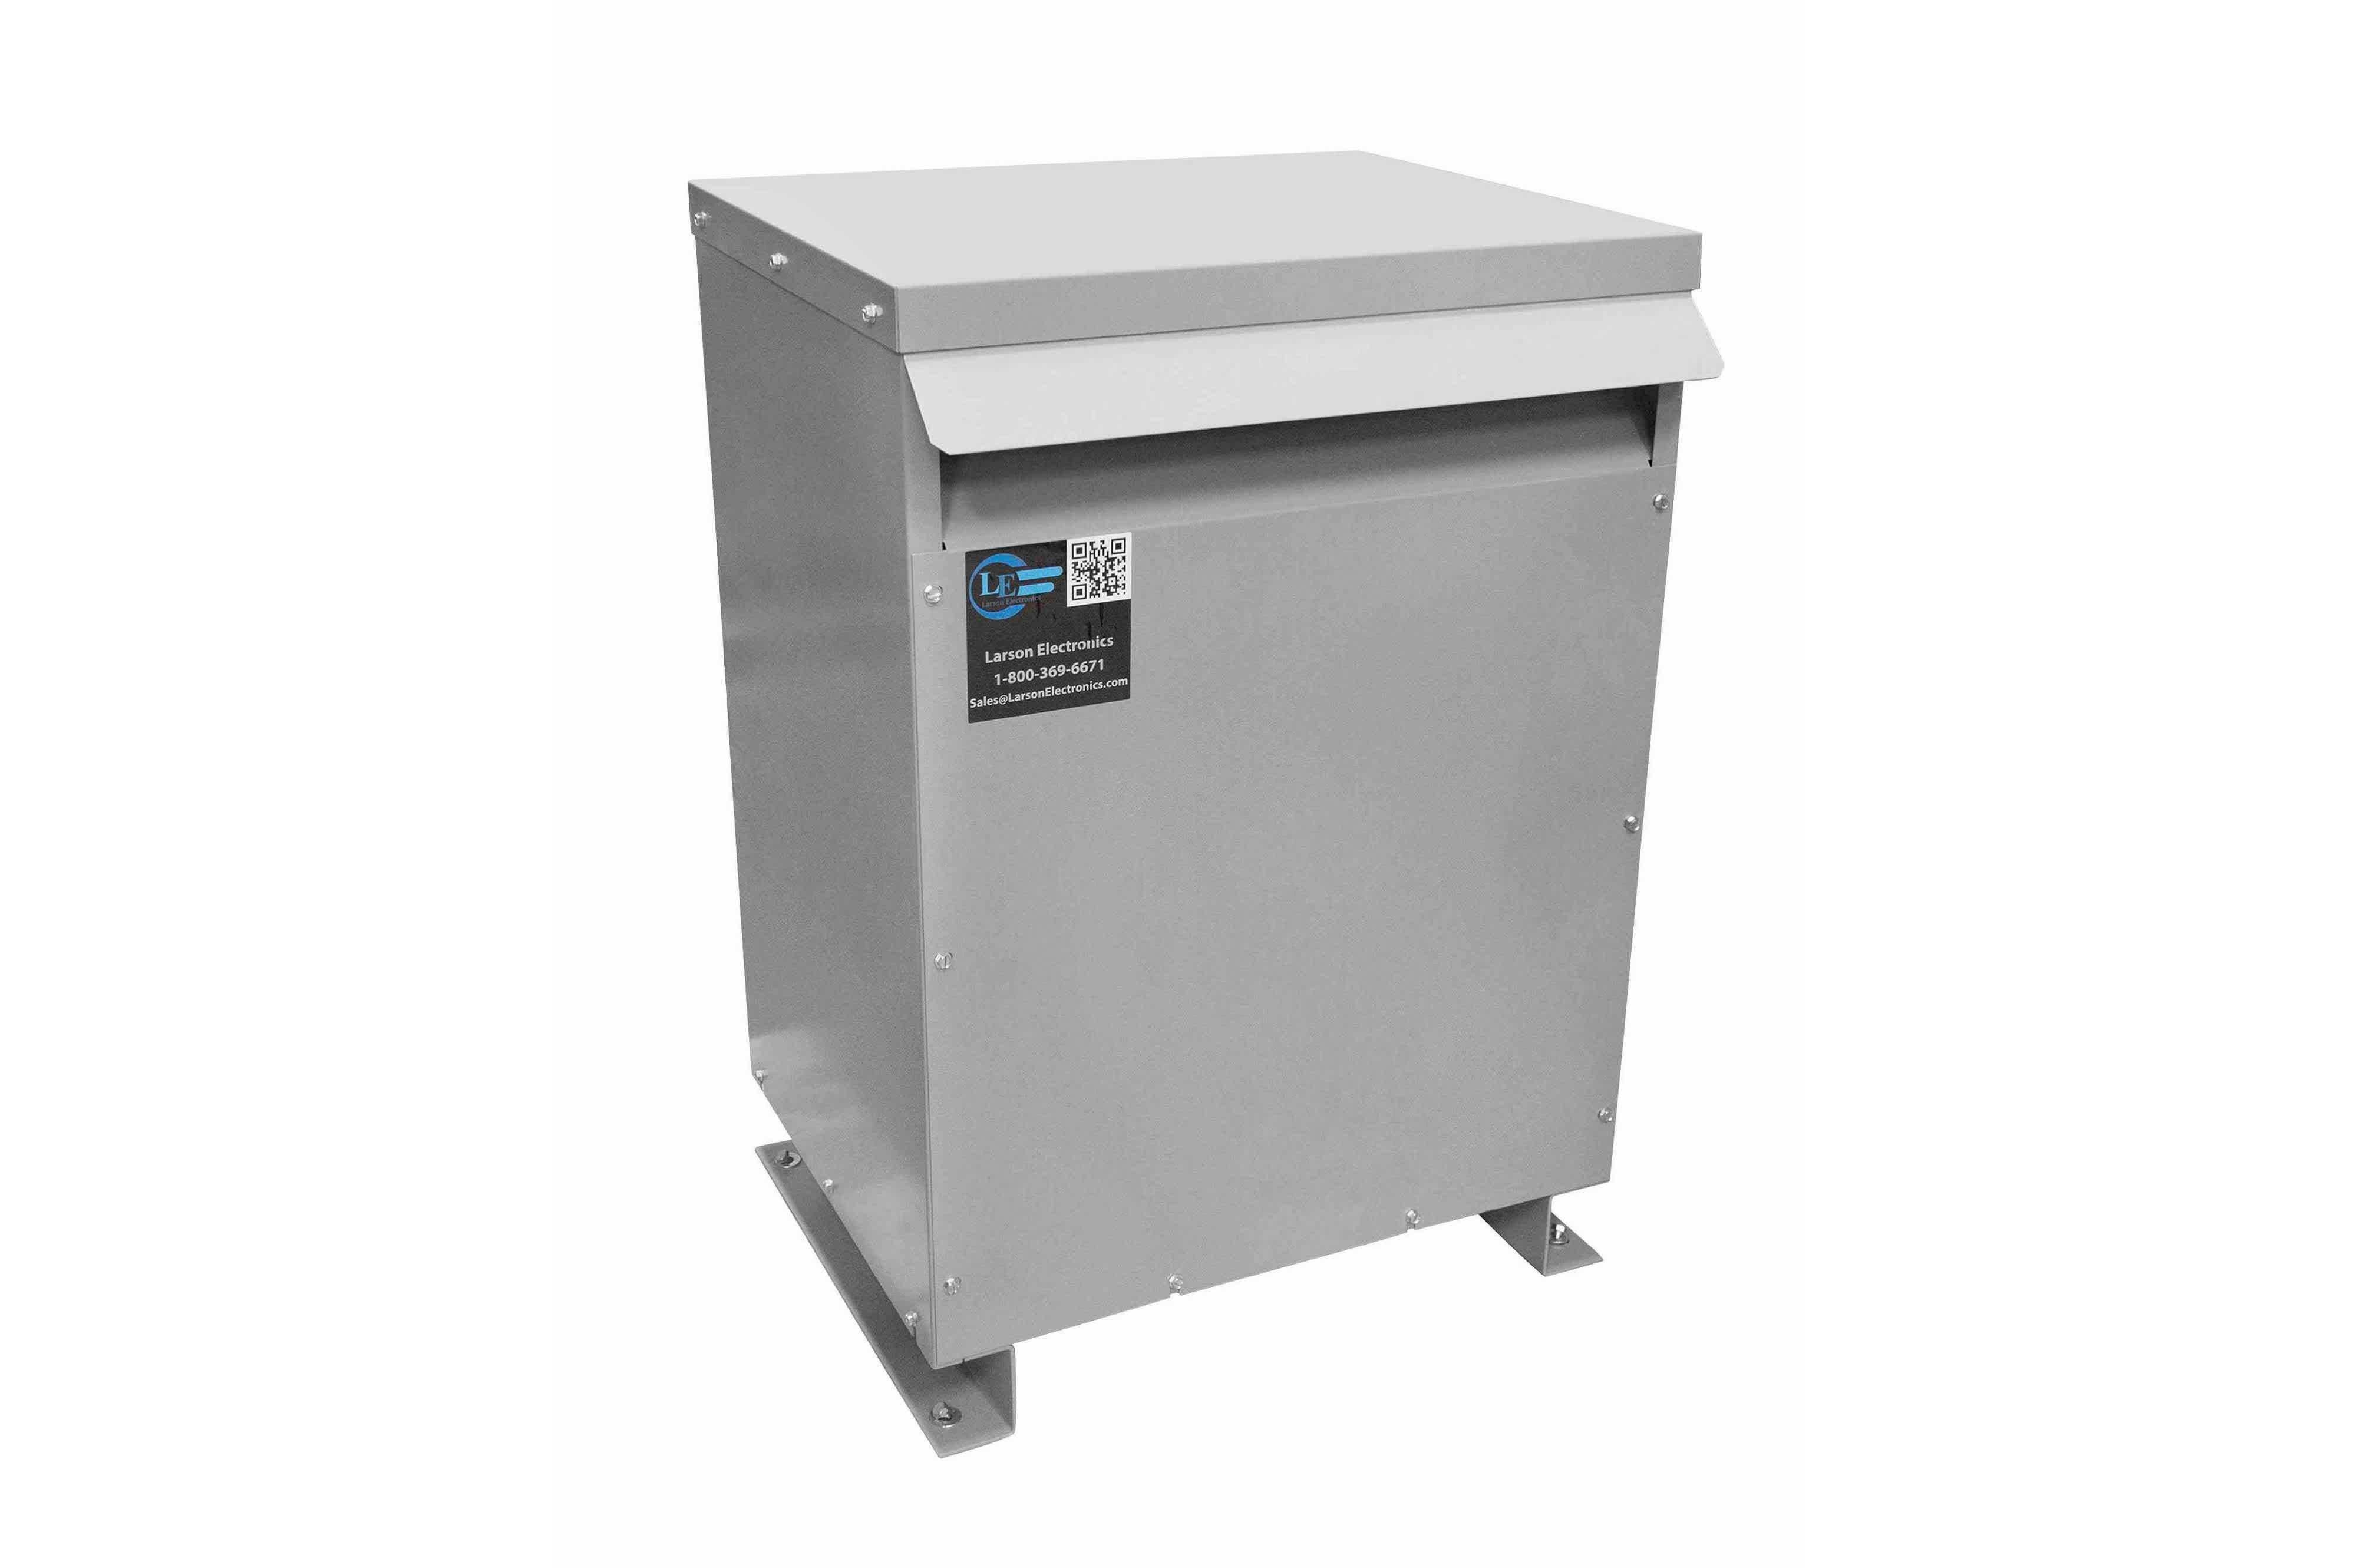 700 kVA 3PH DOE Transformer, 380V Delta Primary, 208Y/120 Wye-N Secondary, N3R, Ventilated, 60 Hz